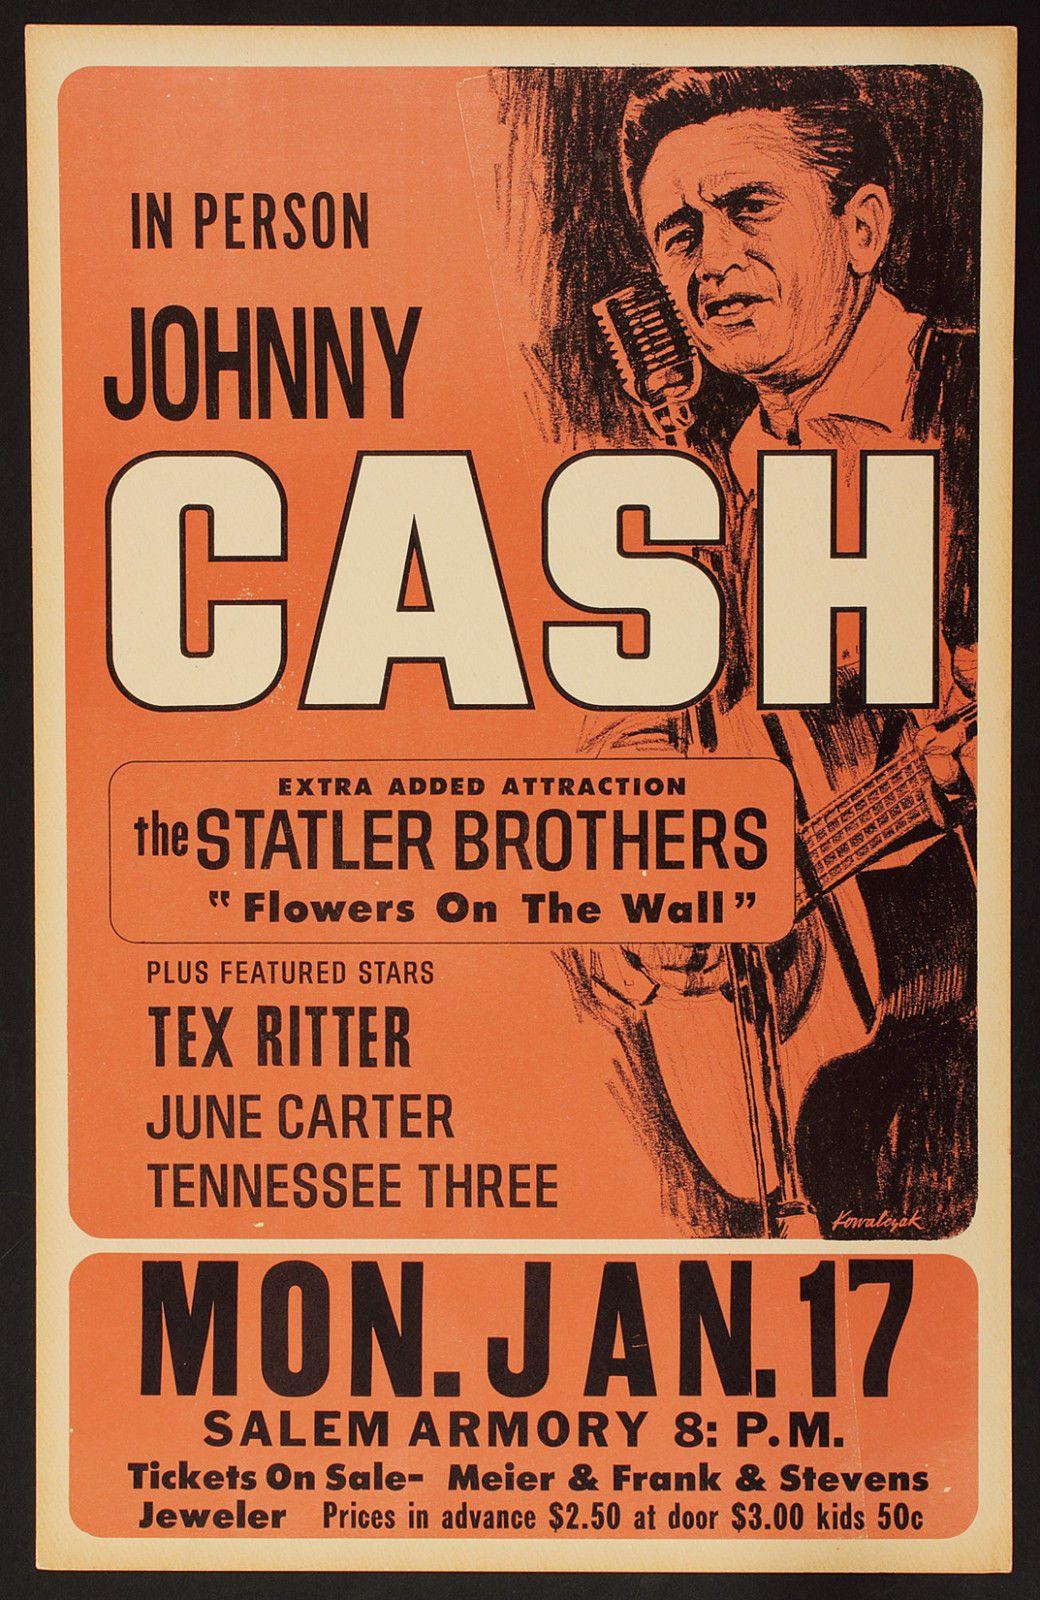 35b042aef Framed Vintage Music Concert Poster Johnny Cash (Replica Picture Artwork  Art) #ebay #Home & Garden